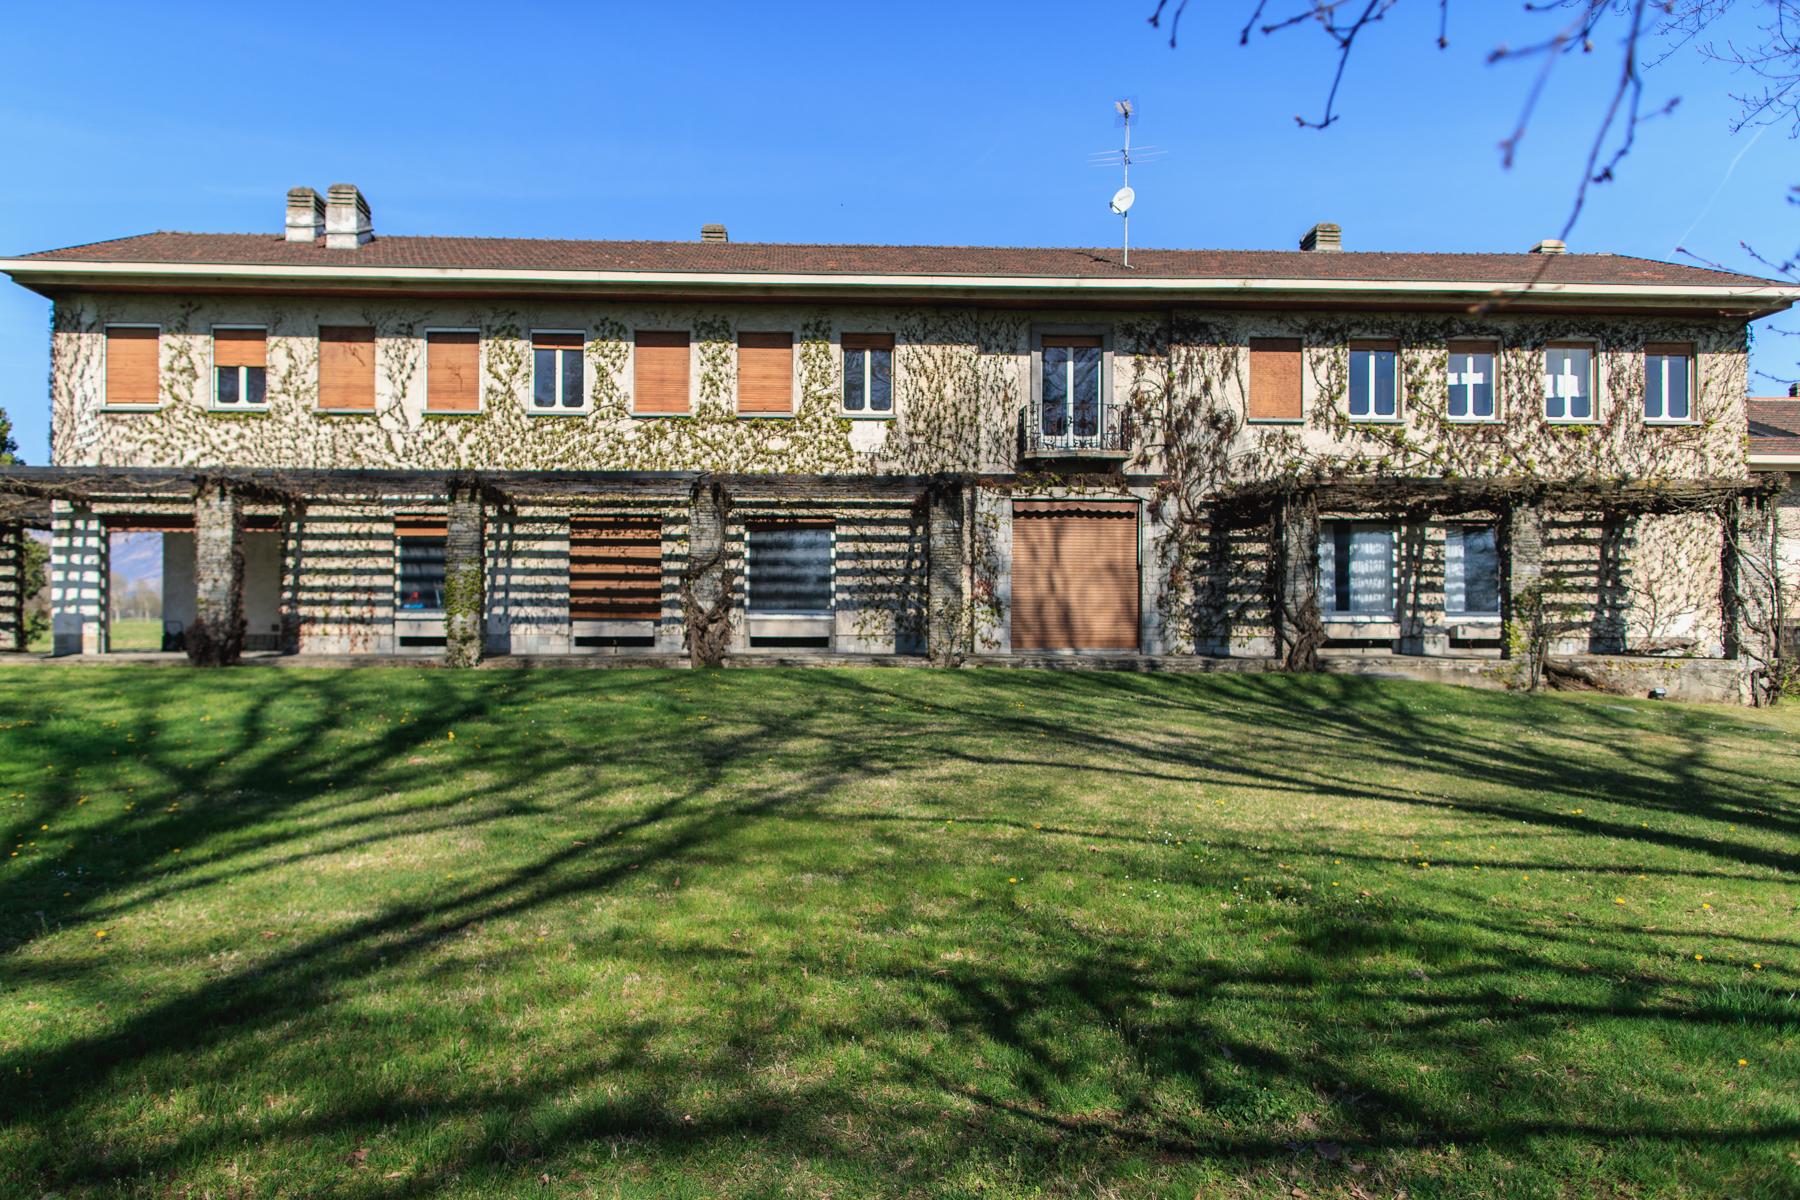 Casa indipendente in Vendita a Venaria: 5 locali, 1000 mq - Foto 5